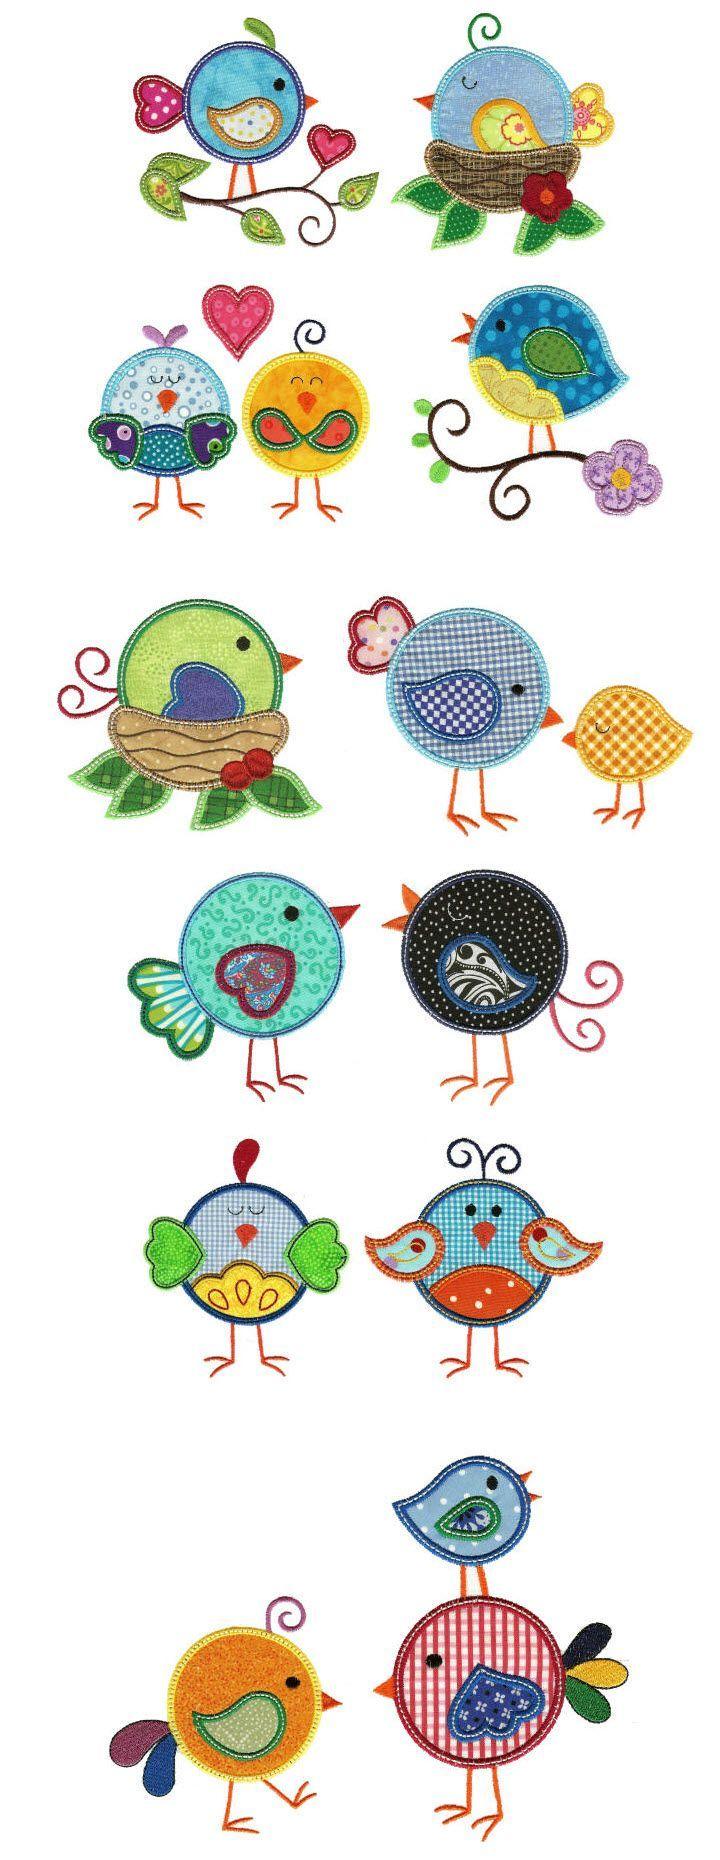 Sweet Tweets Applique  http://www.designsbyjuju.com/products/dbjj527.aspx  Designs by JuJu machine embroidery designs